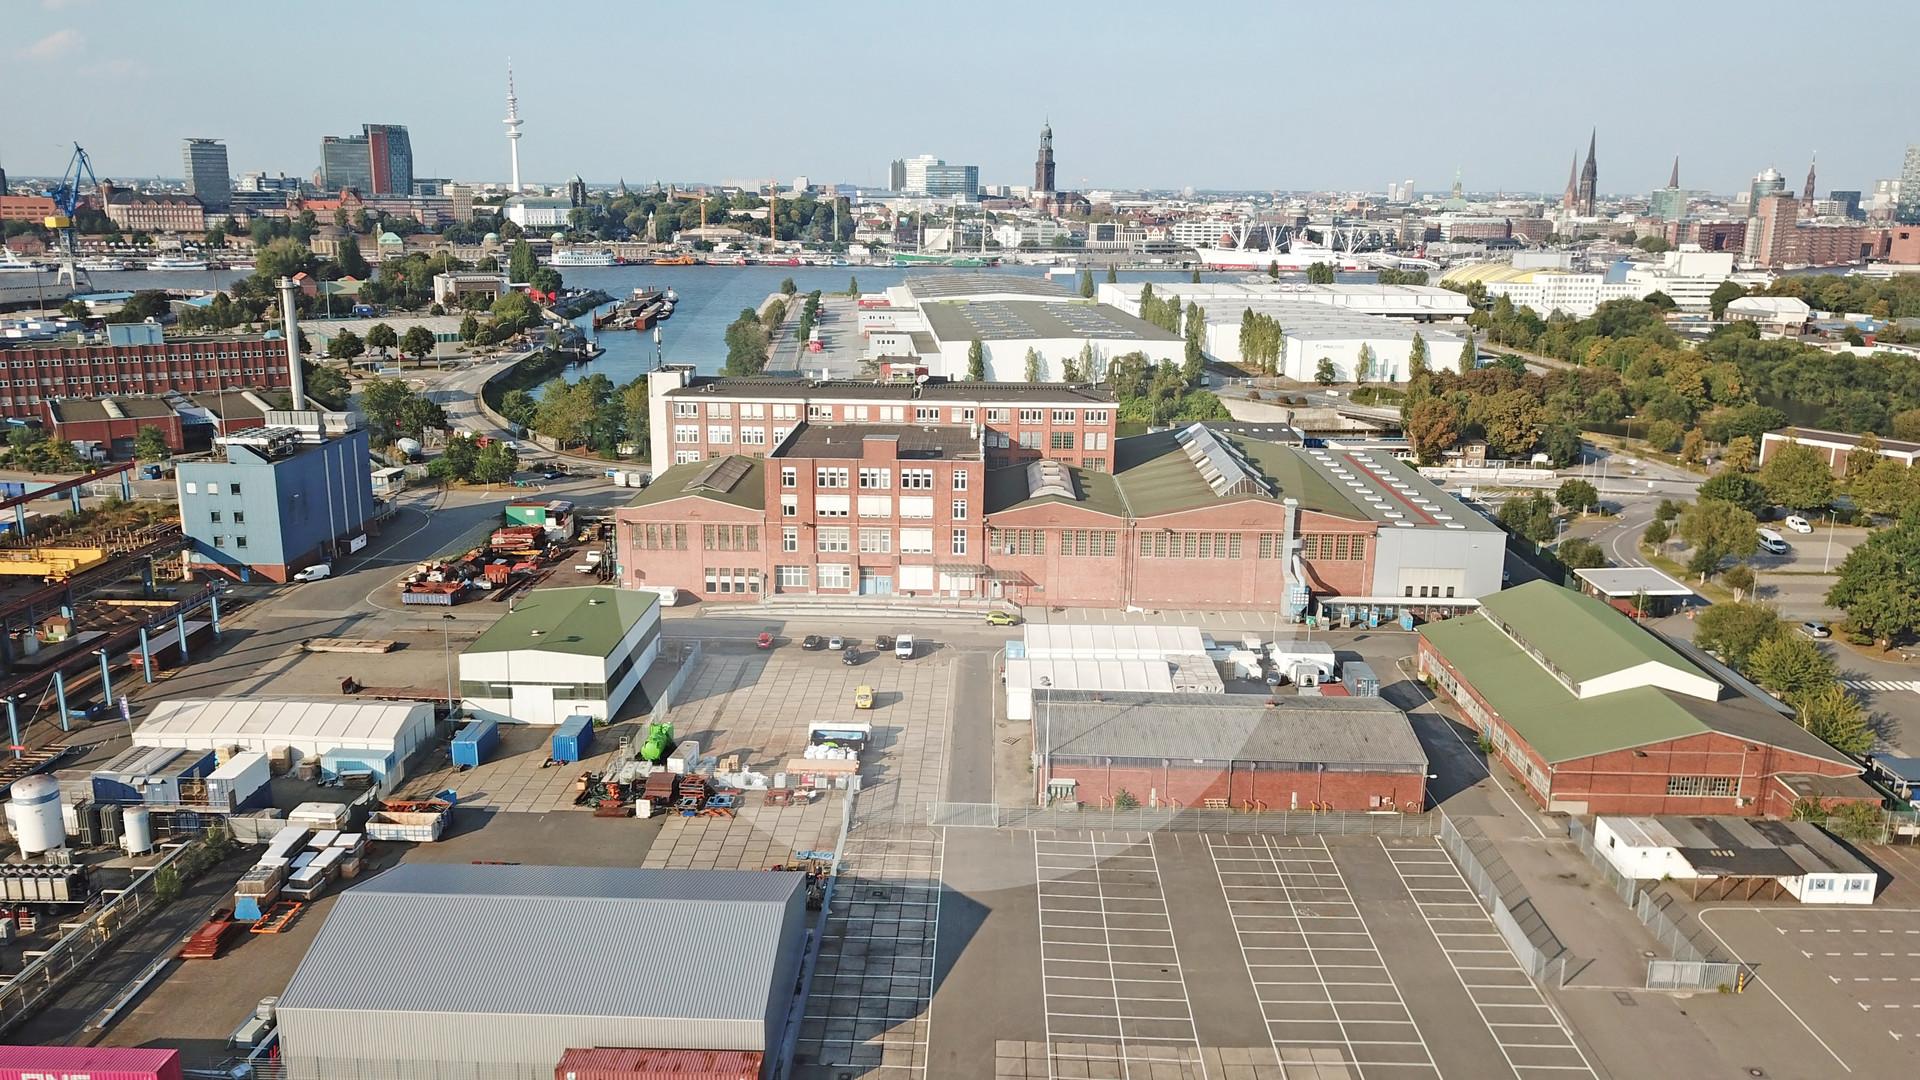 Procurator: Hafenareal Steinwerder